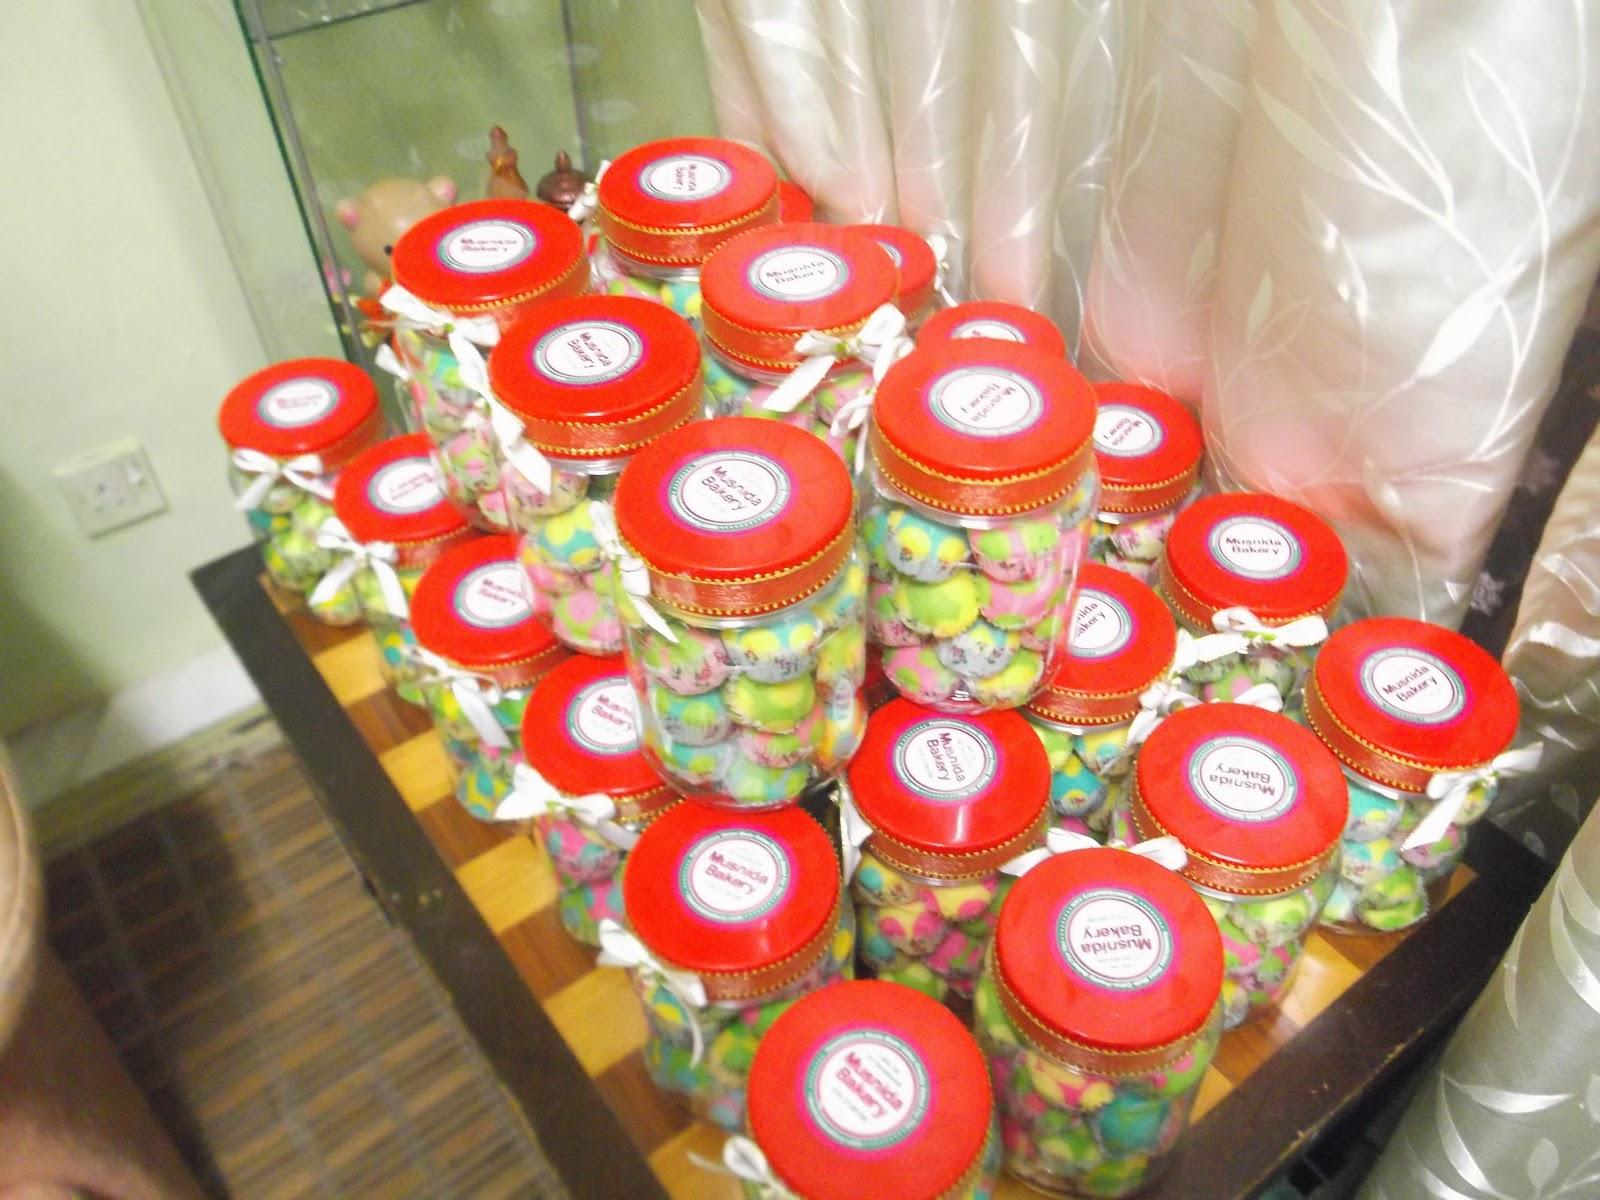 Sejiwa doorgift 39 s doorgift botol kaca yang cantik dan menarik for Idea door gift kahwin bajet